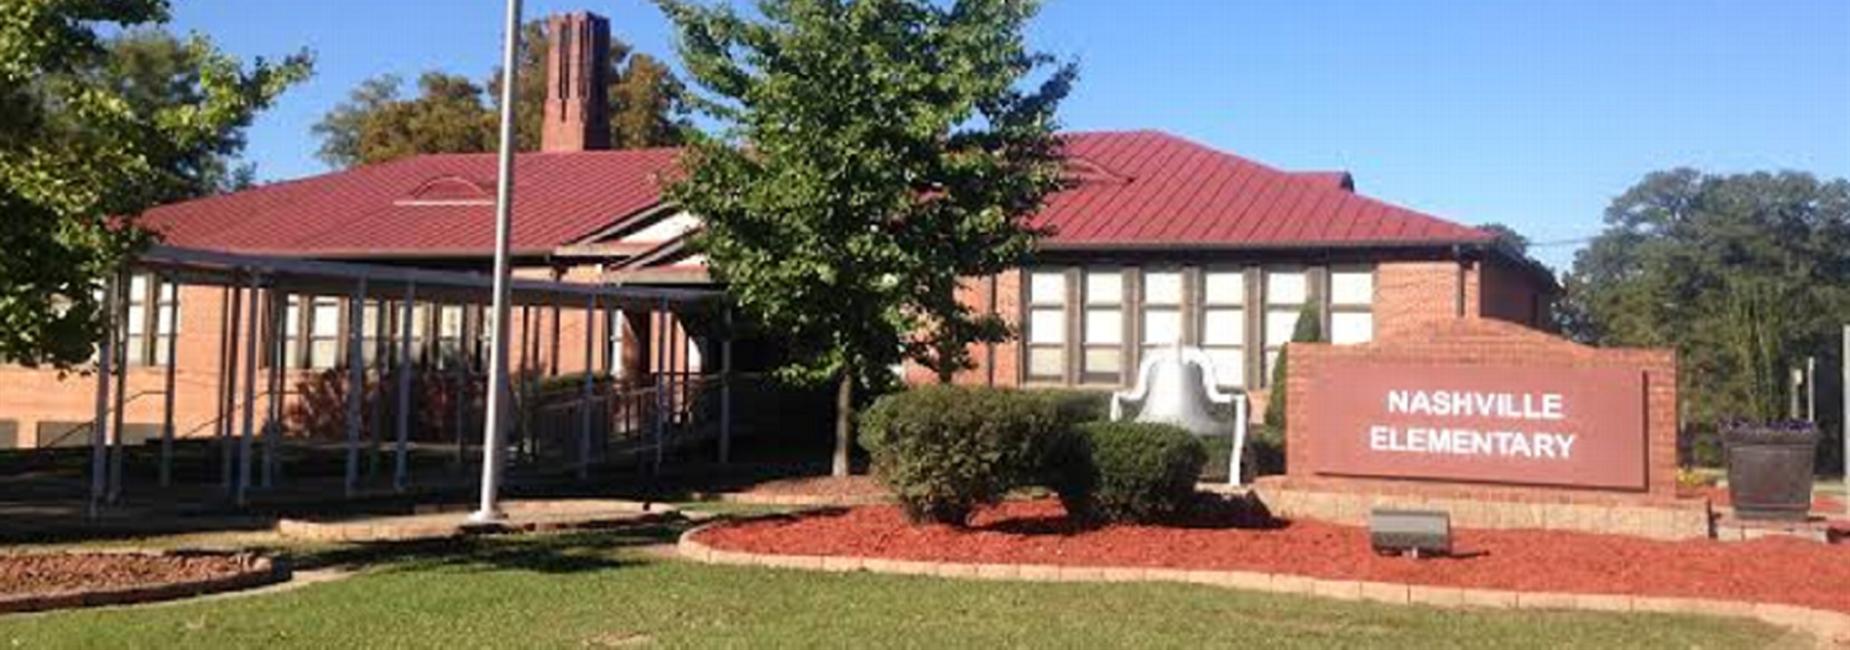 Nashville Elementary School